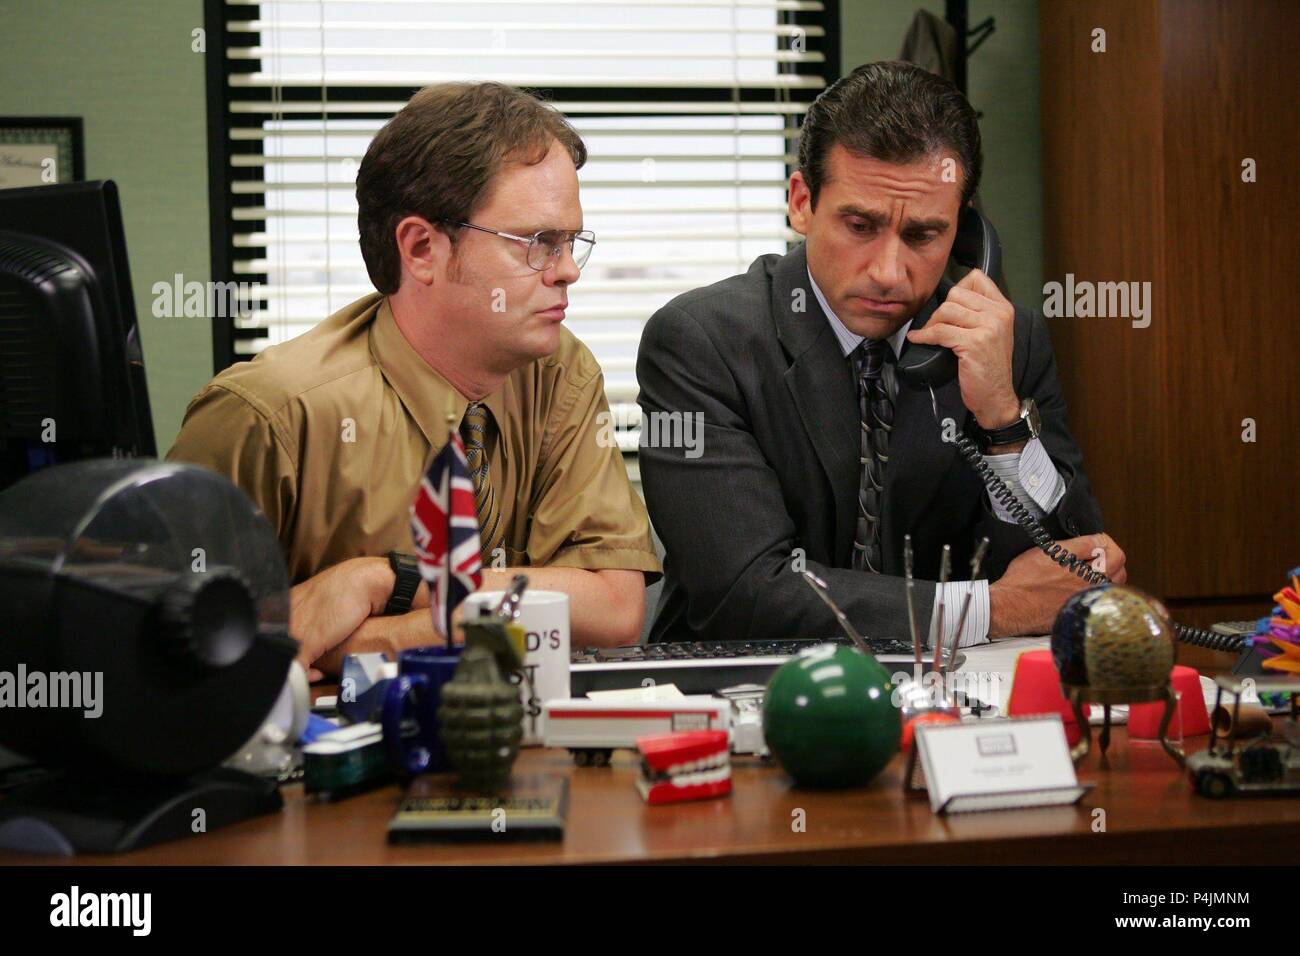 Description: Season 3. Original Film Title: Office, The. English Title:  Office, The. Film Director: Ricky Gervais; Stephen Merchant. Year: 2005.